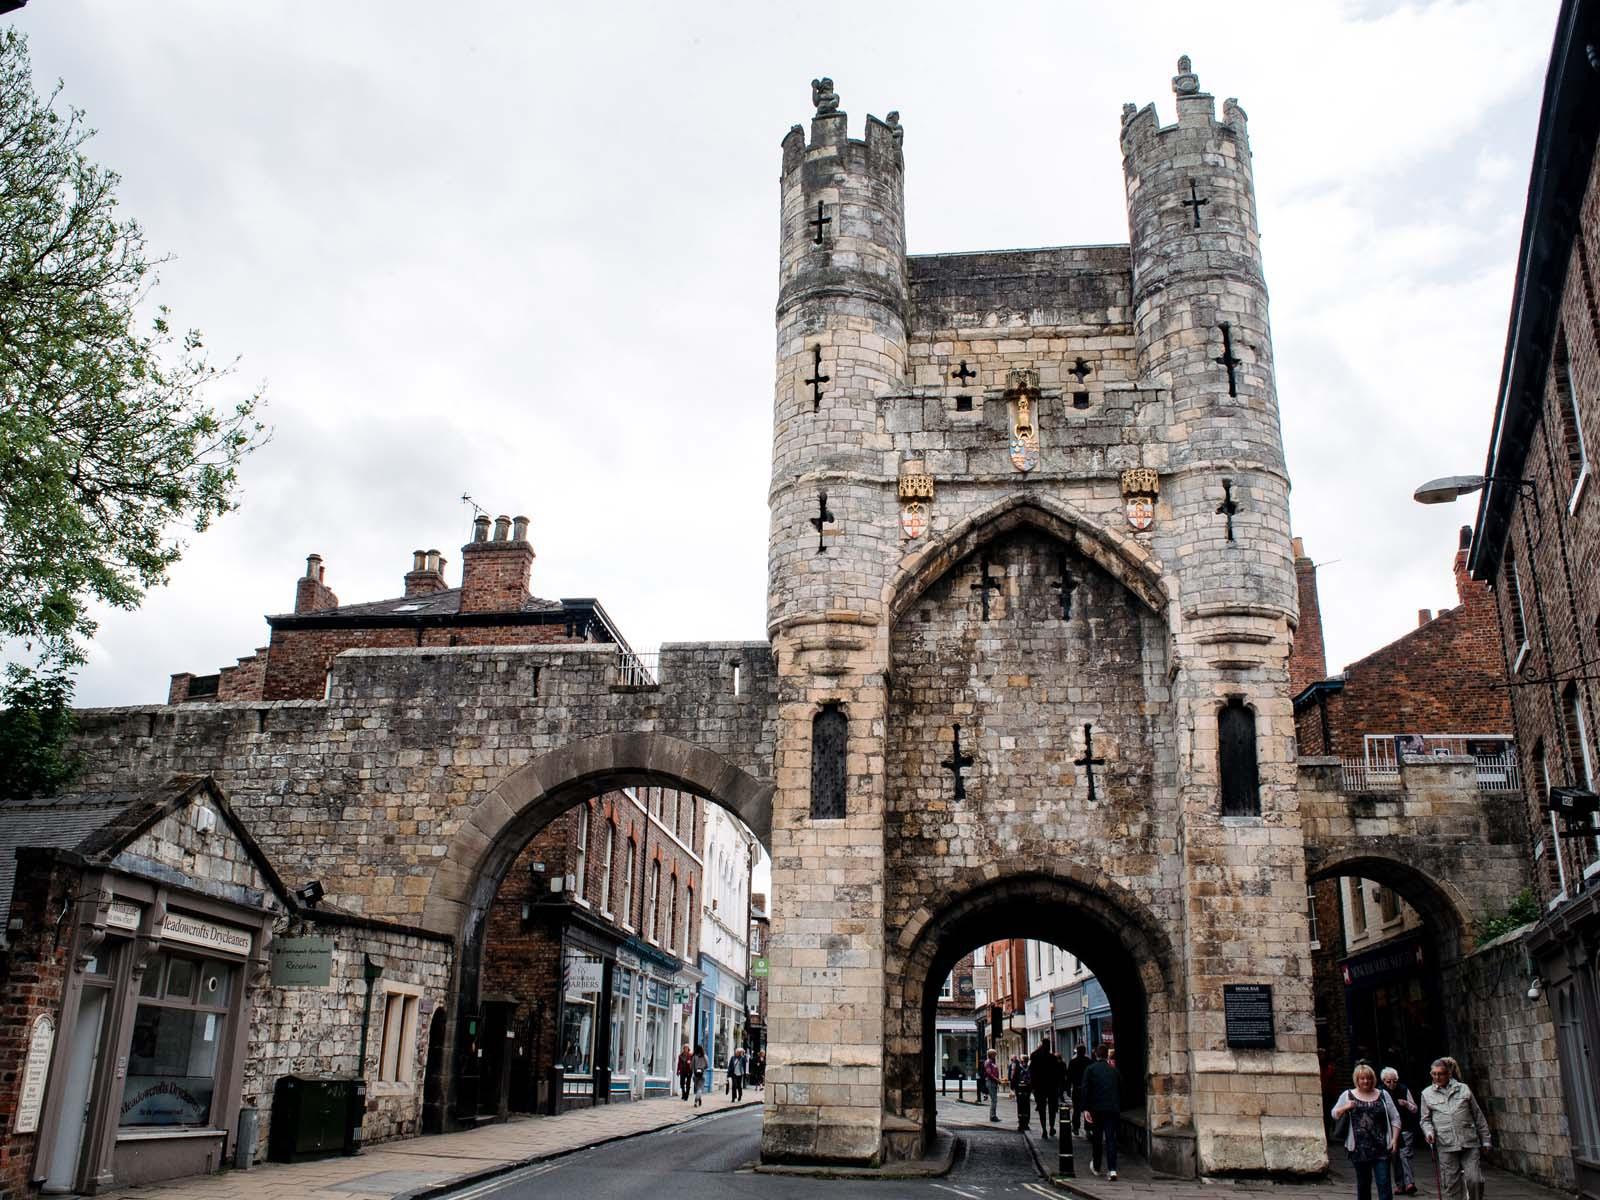 Historic buildings in York city centre